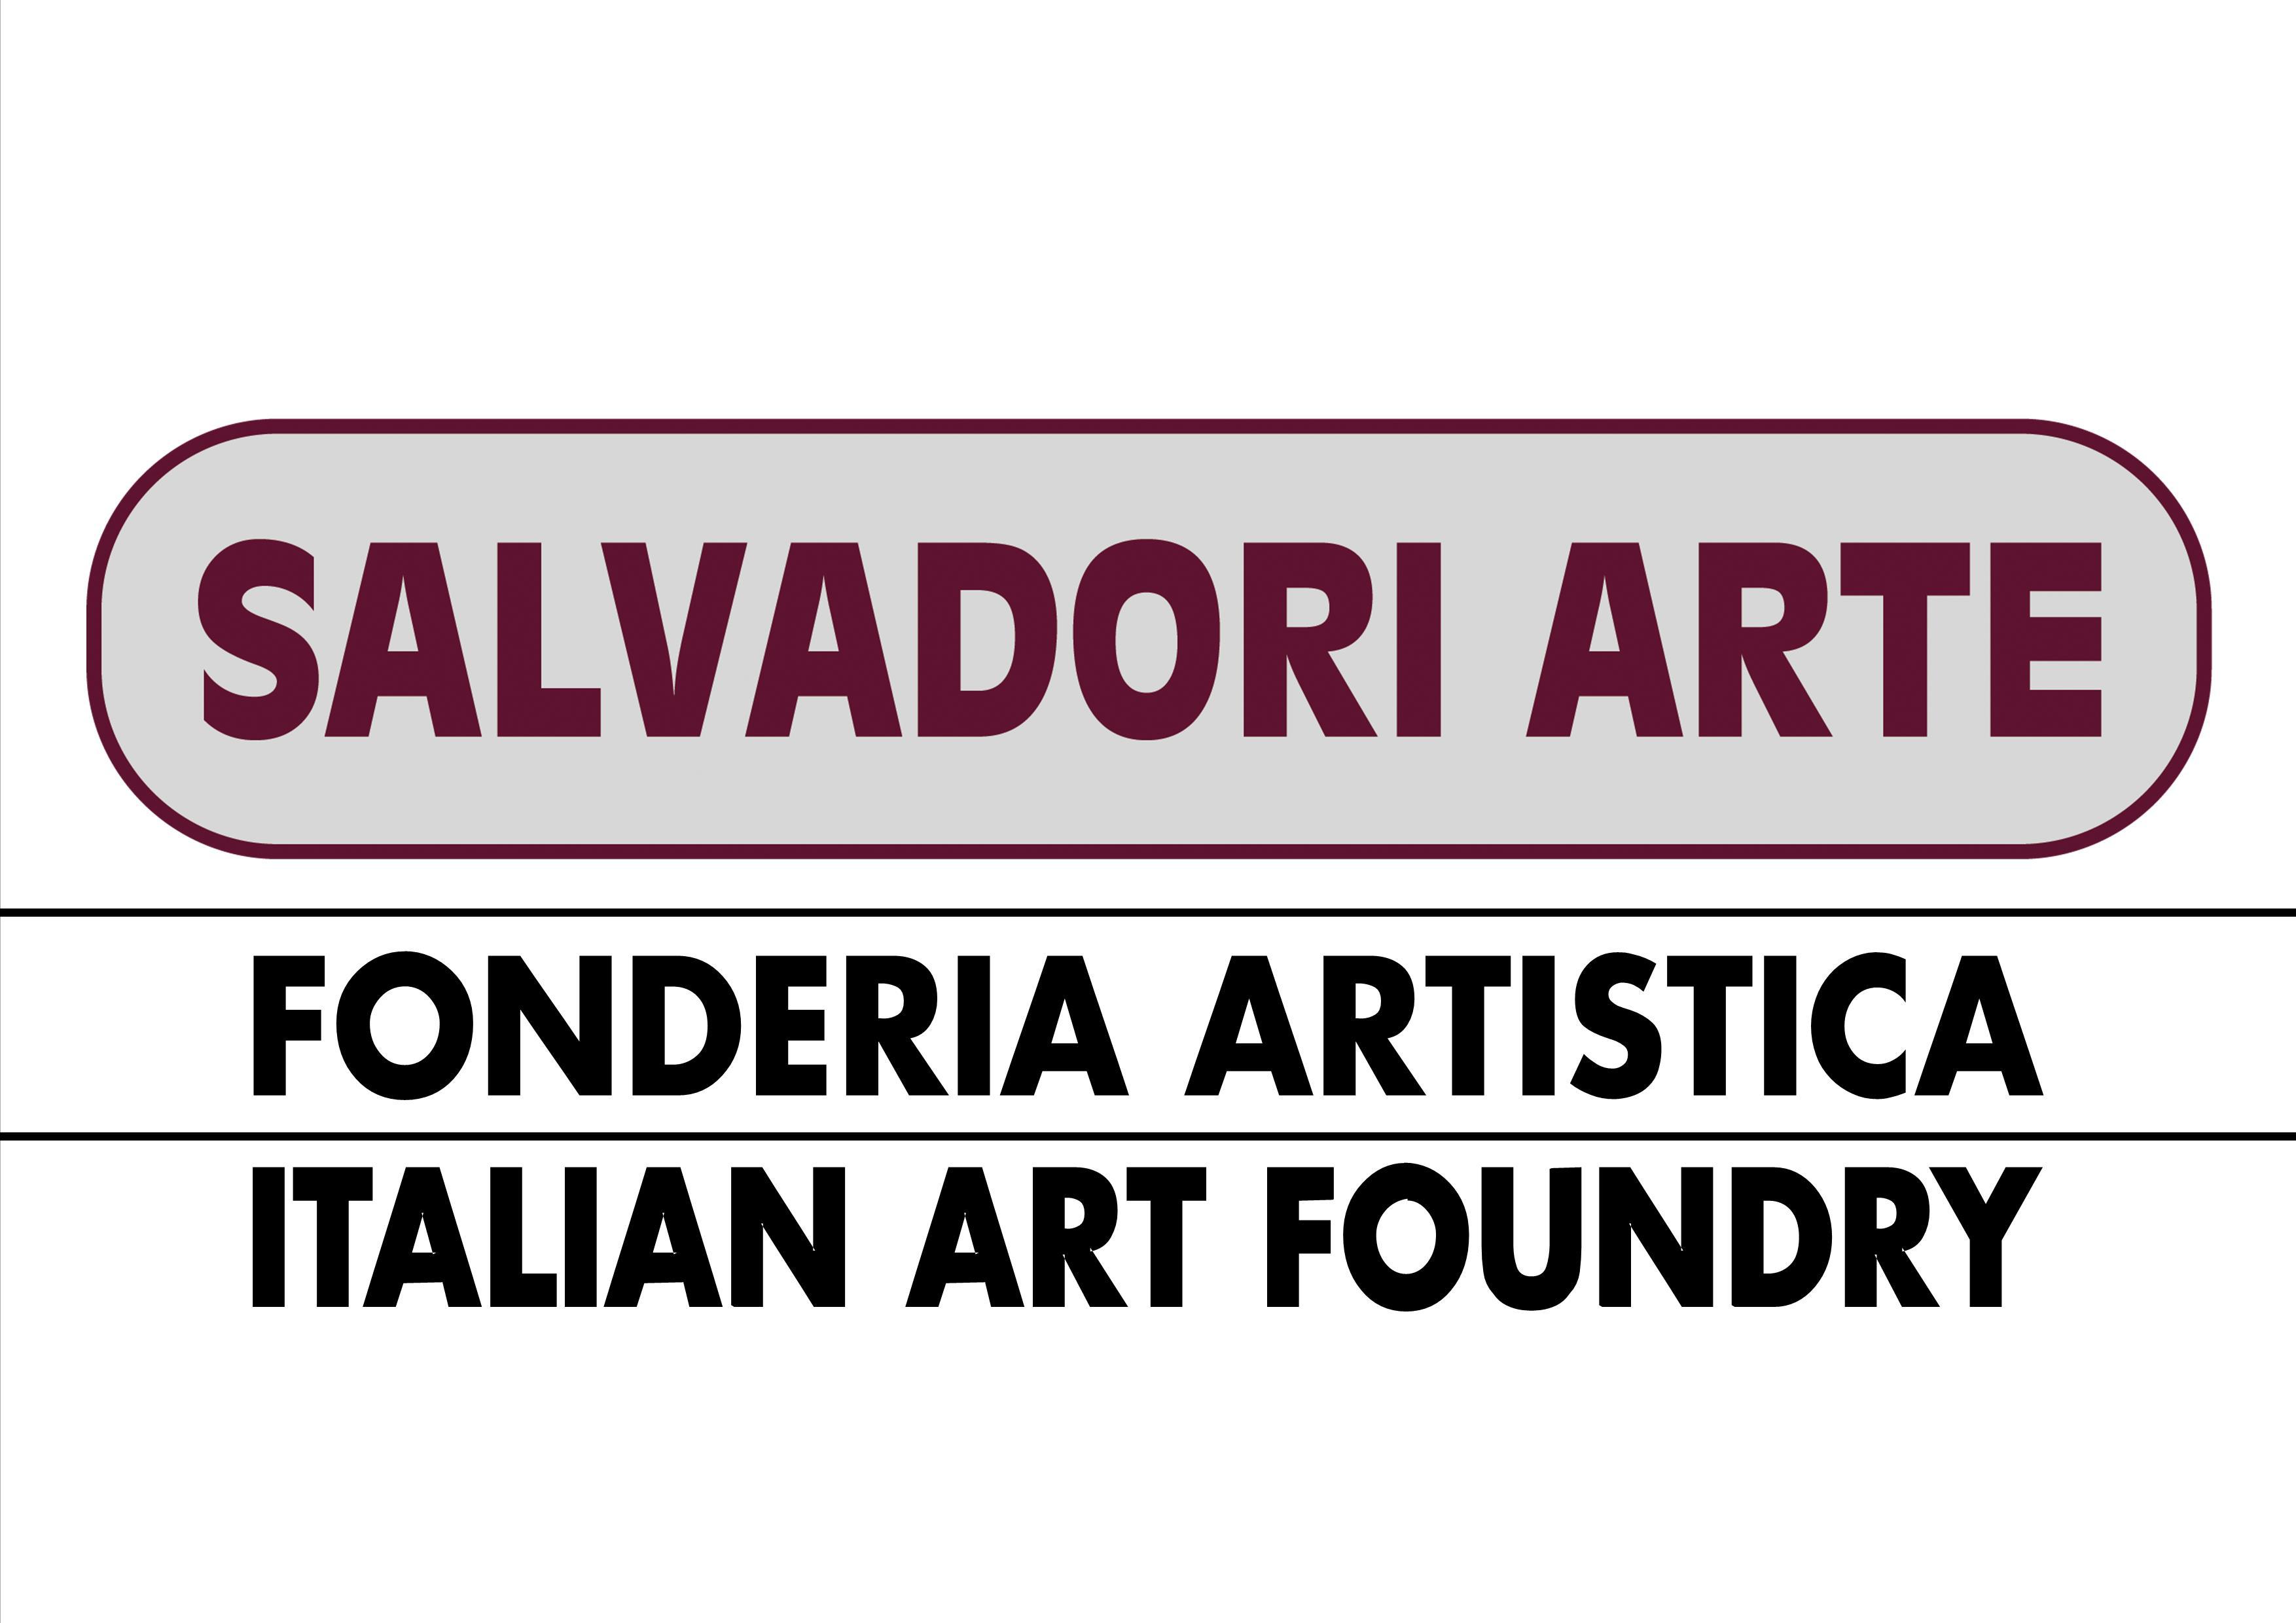 Salvadori arte fonderia artistica fusione a cera persa for Cera arredamenti